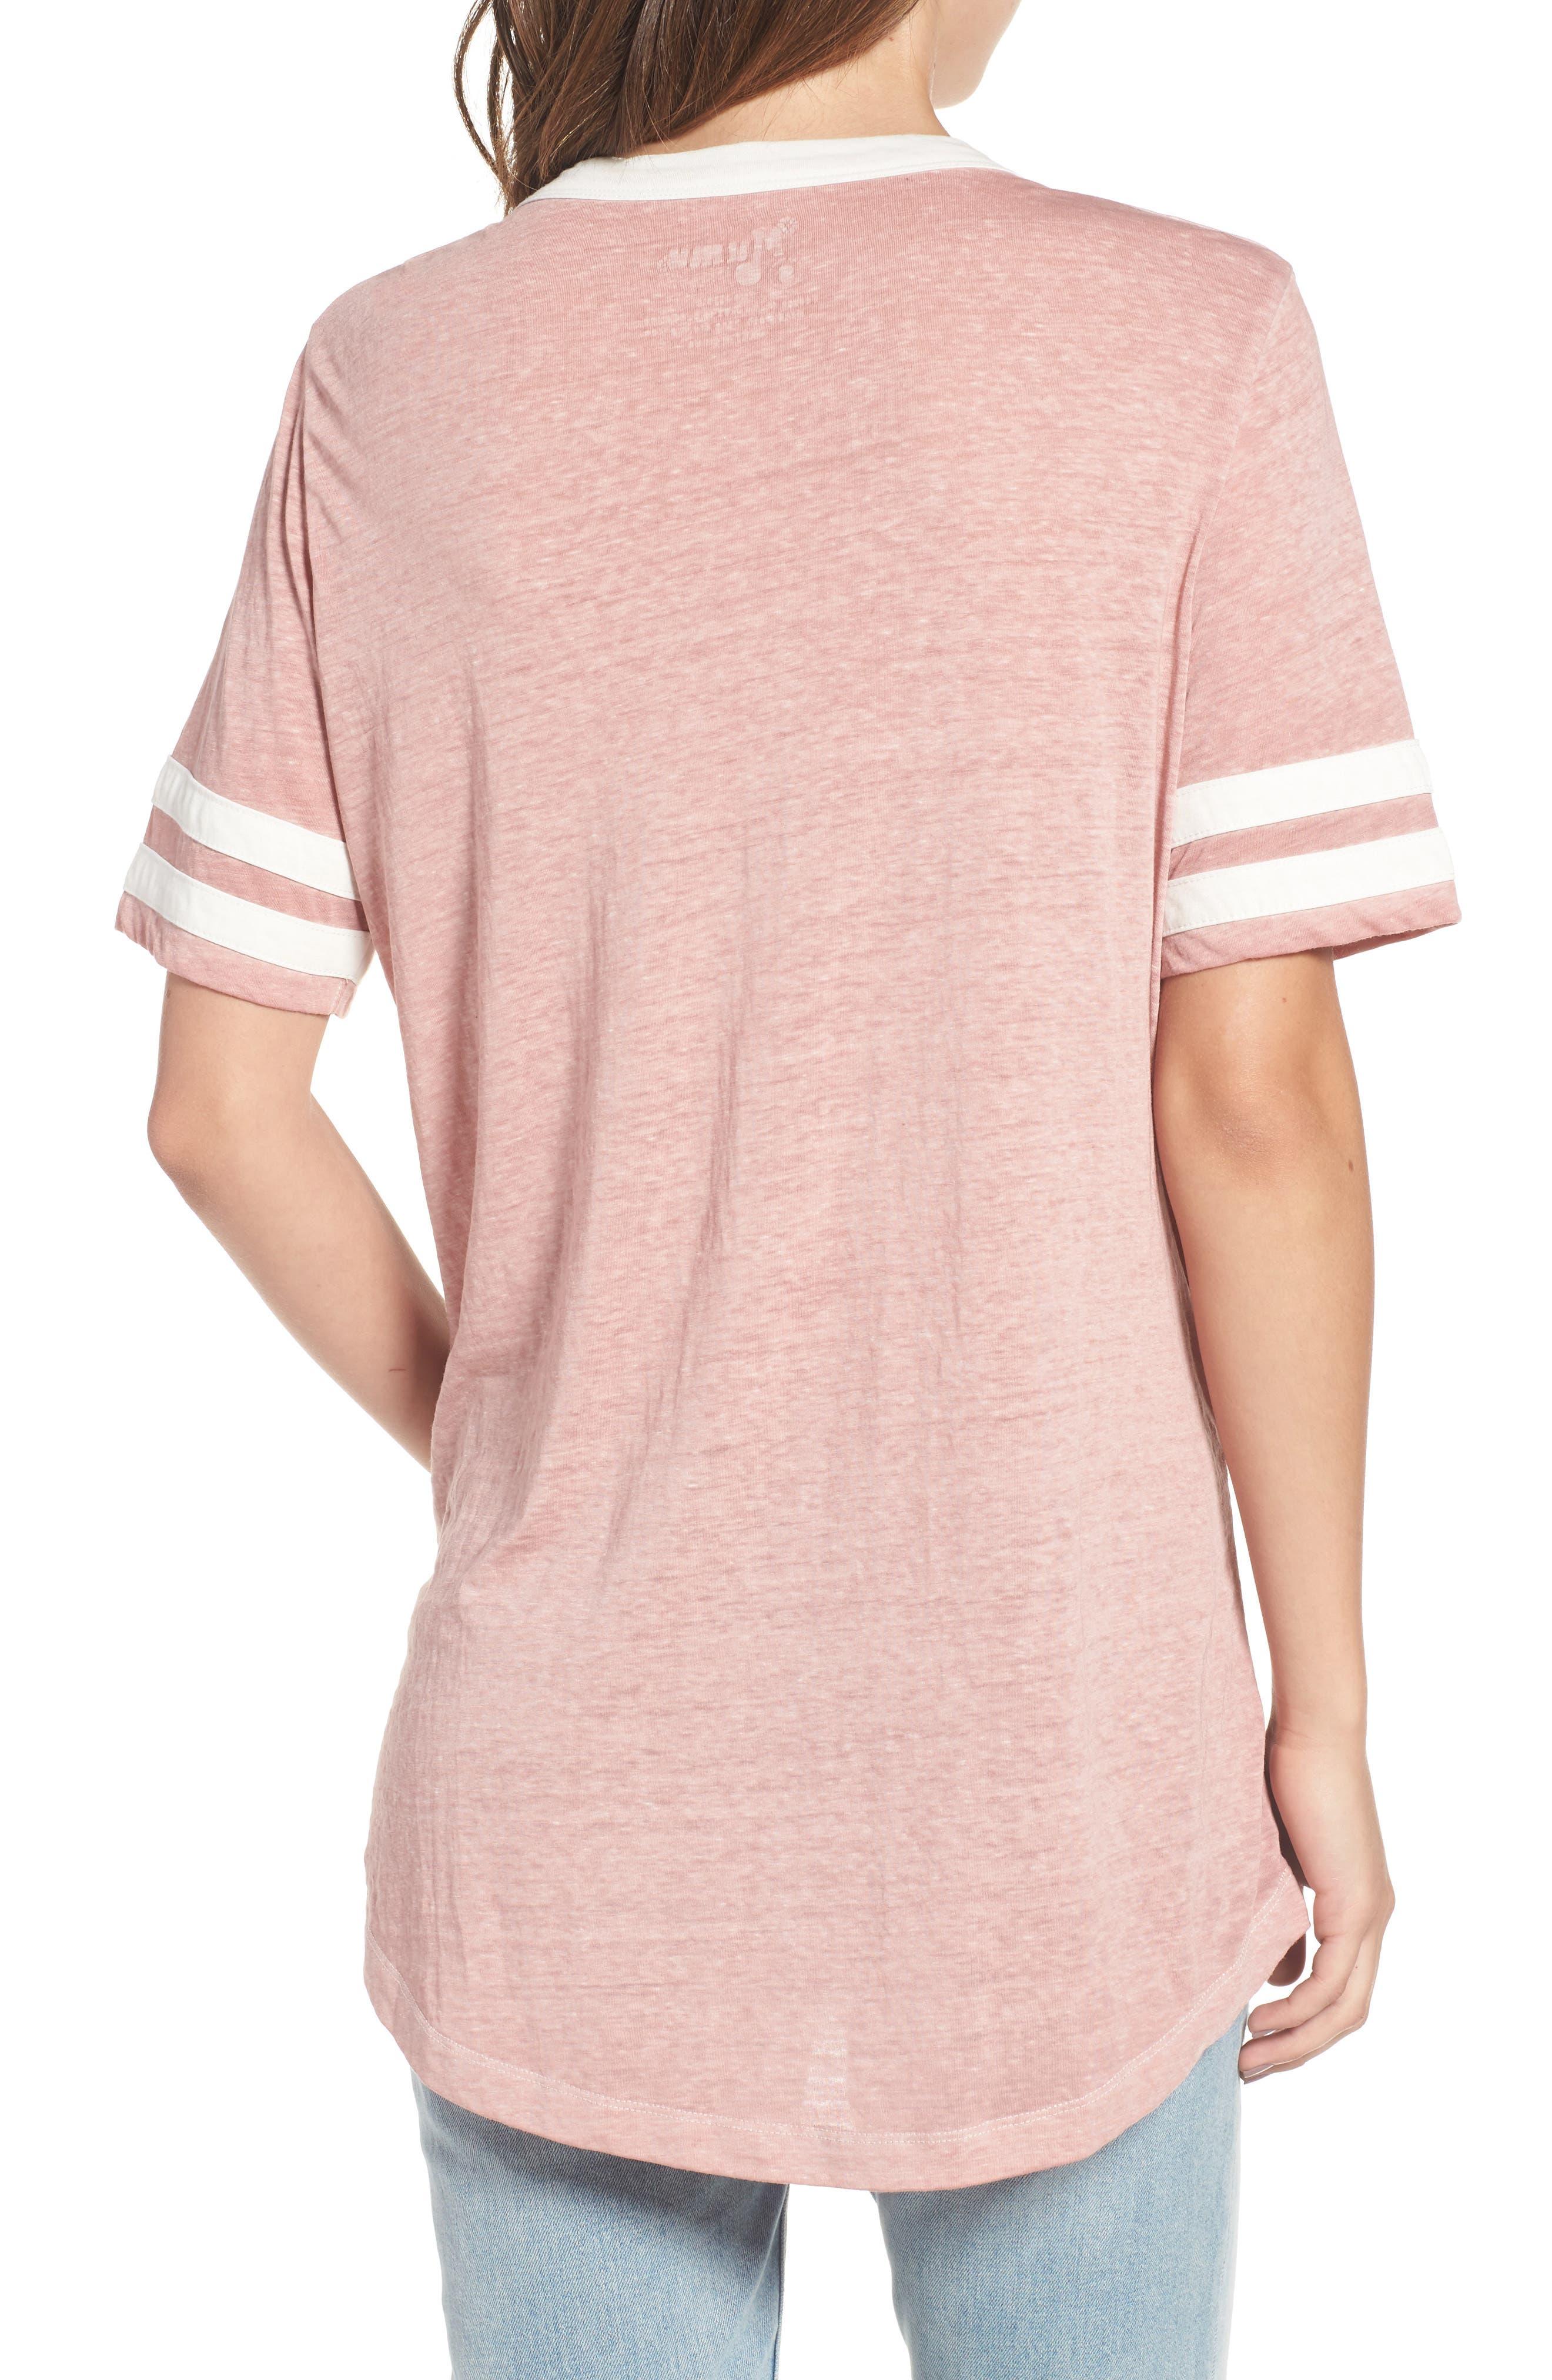 Alternate Image 2  - Show Me Your Mumu Boyfriend Cuddle T-Shirt